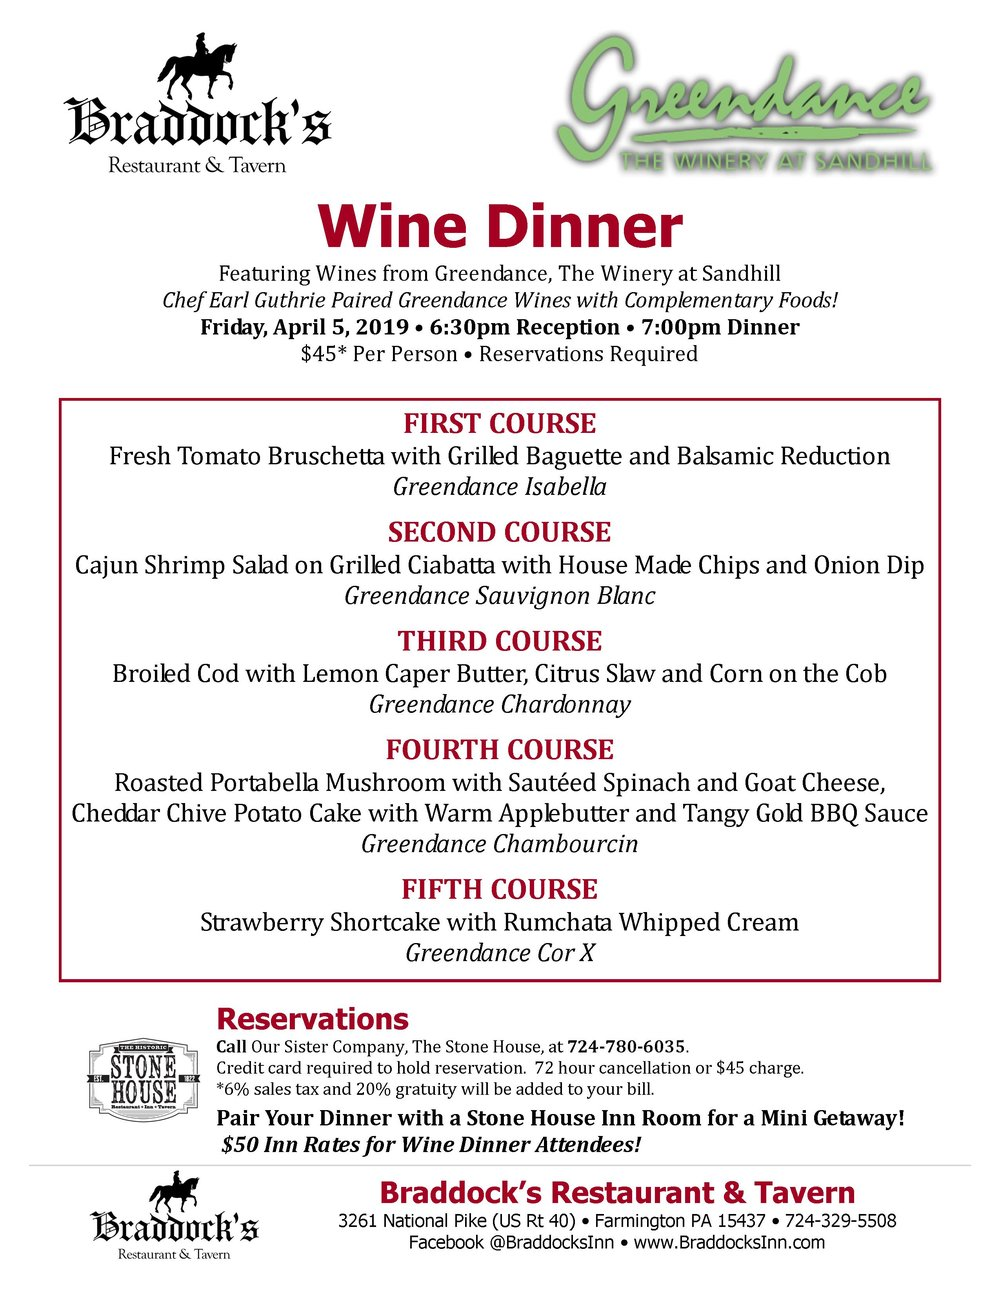 Greendance Wine Dinner 040519.jpg